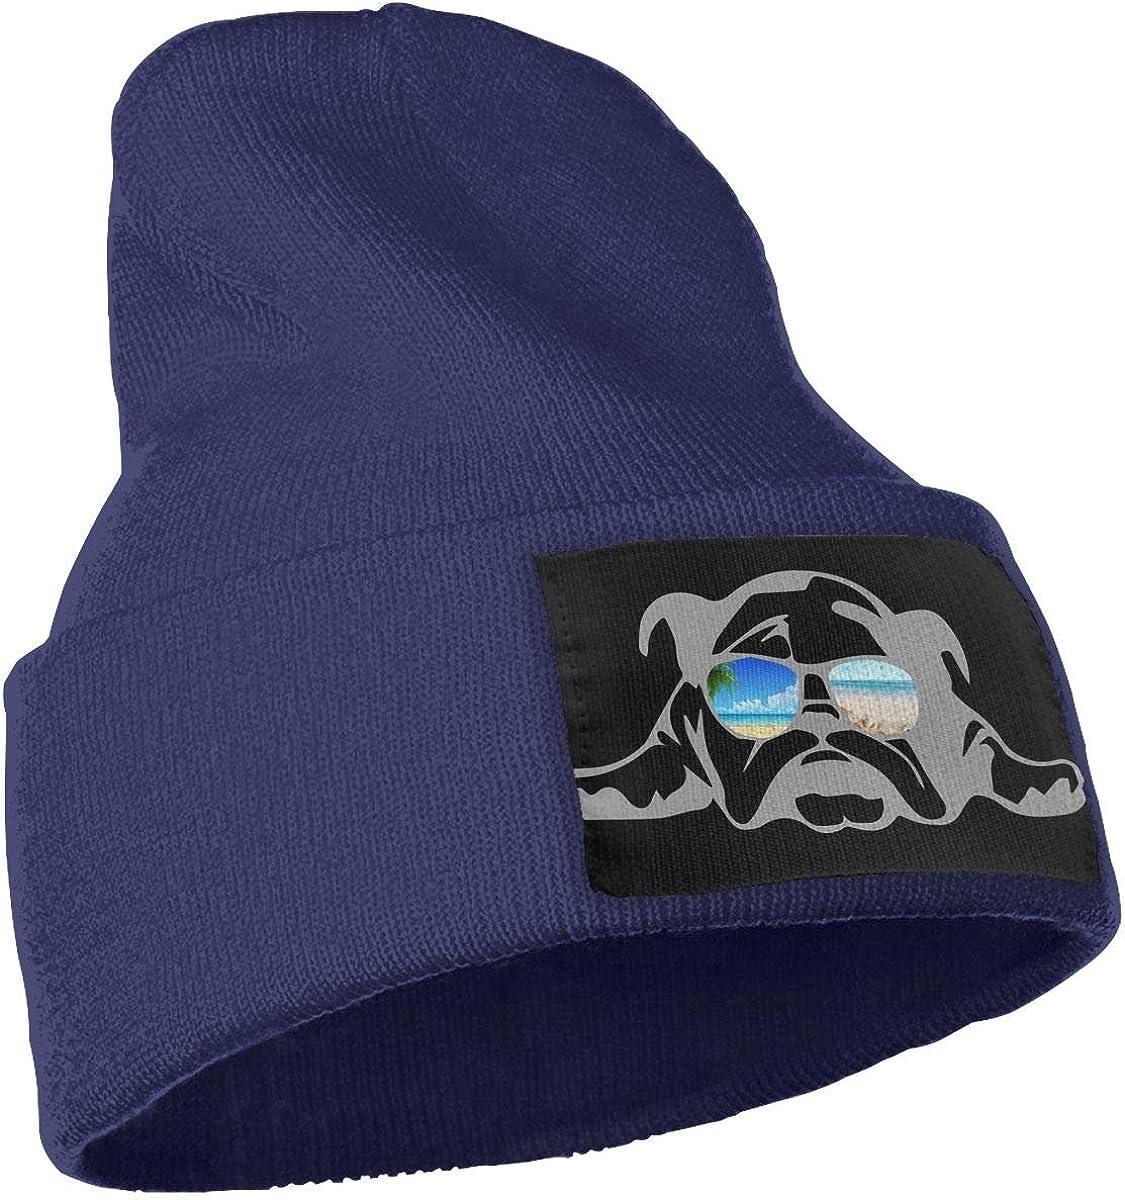 Bulldog Sunglass Vacation Men /& Women Knitting Hats Stretchy /& Soft Ski Cap Beanie